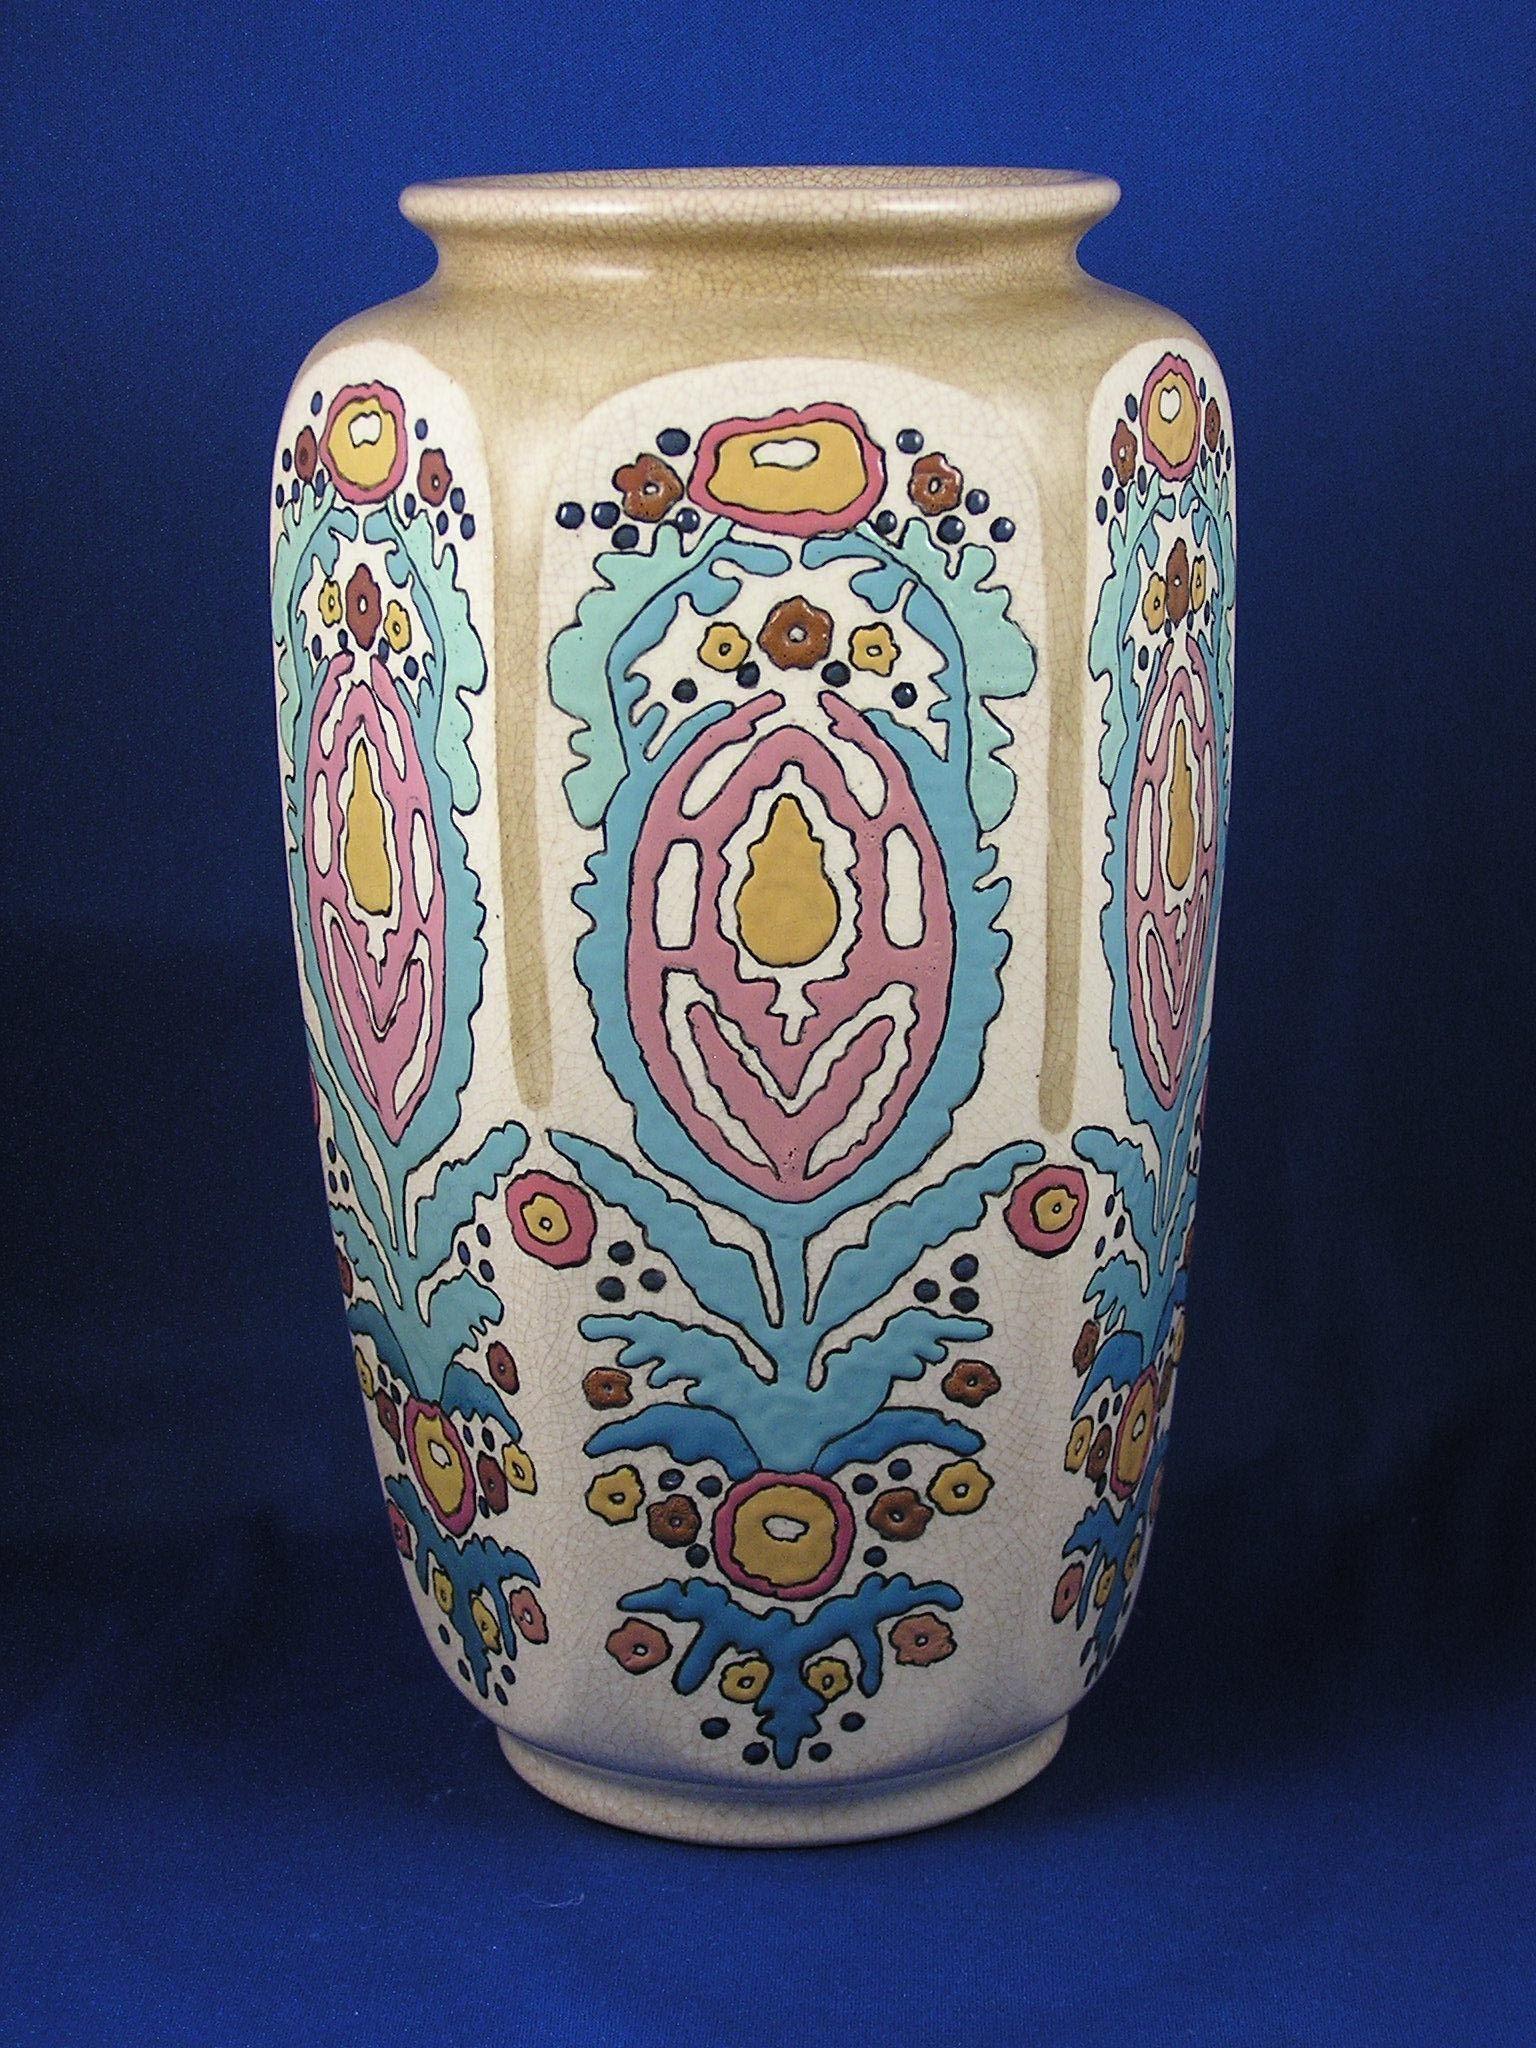 American Satsuma Enameled Arts & Crafts Floral Motif Vase